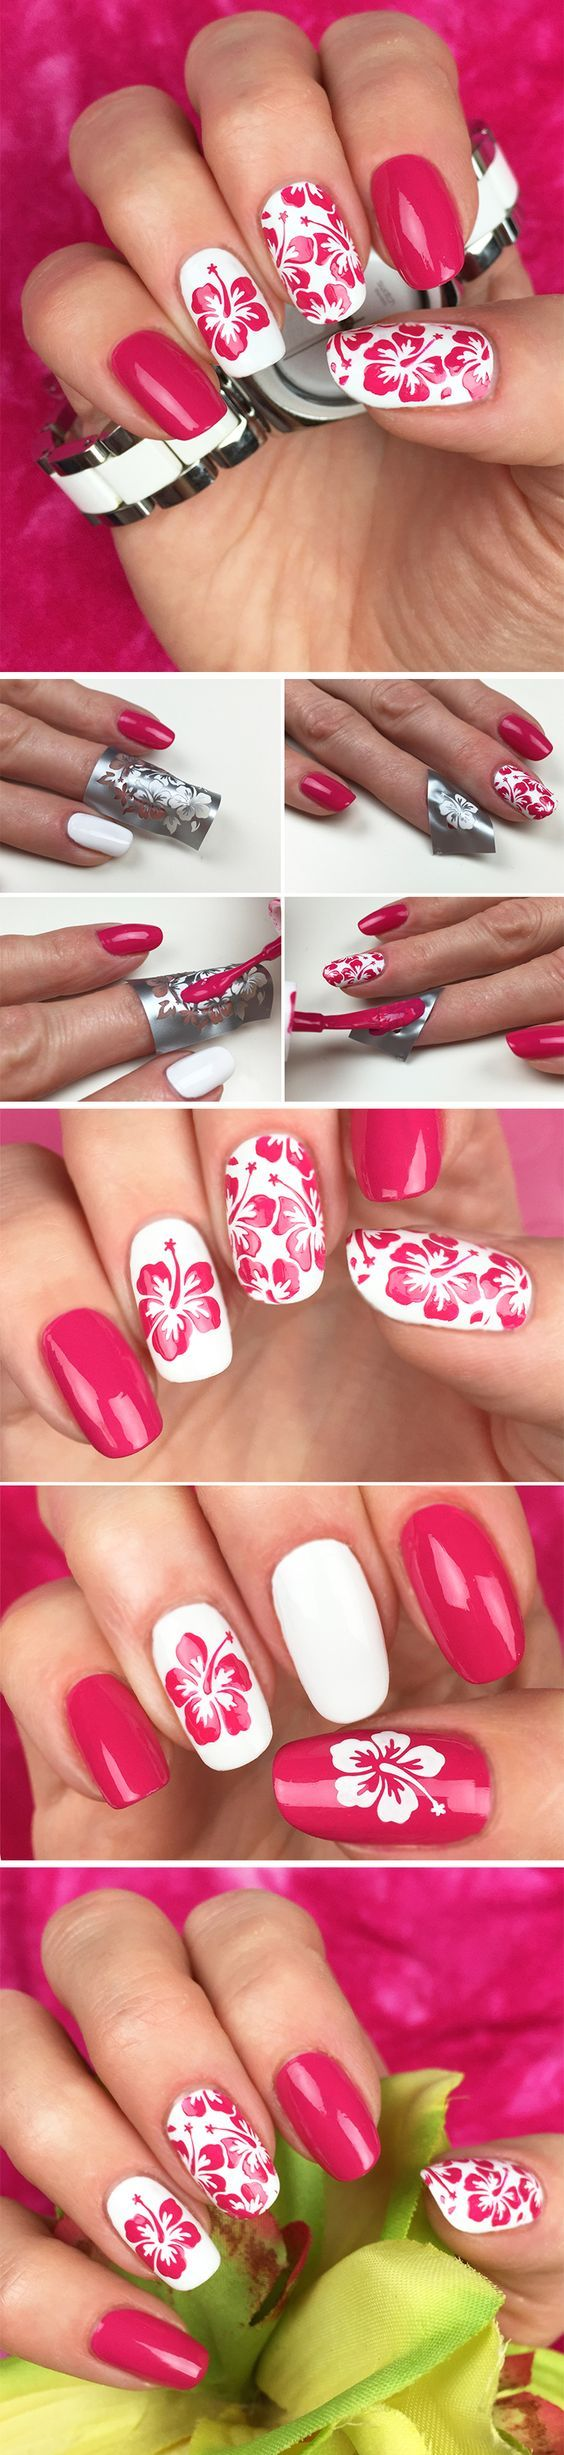 90 best nail ideas images on Pinterest | Nail art, Nail art designs ...